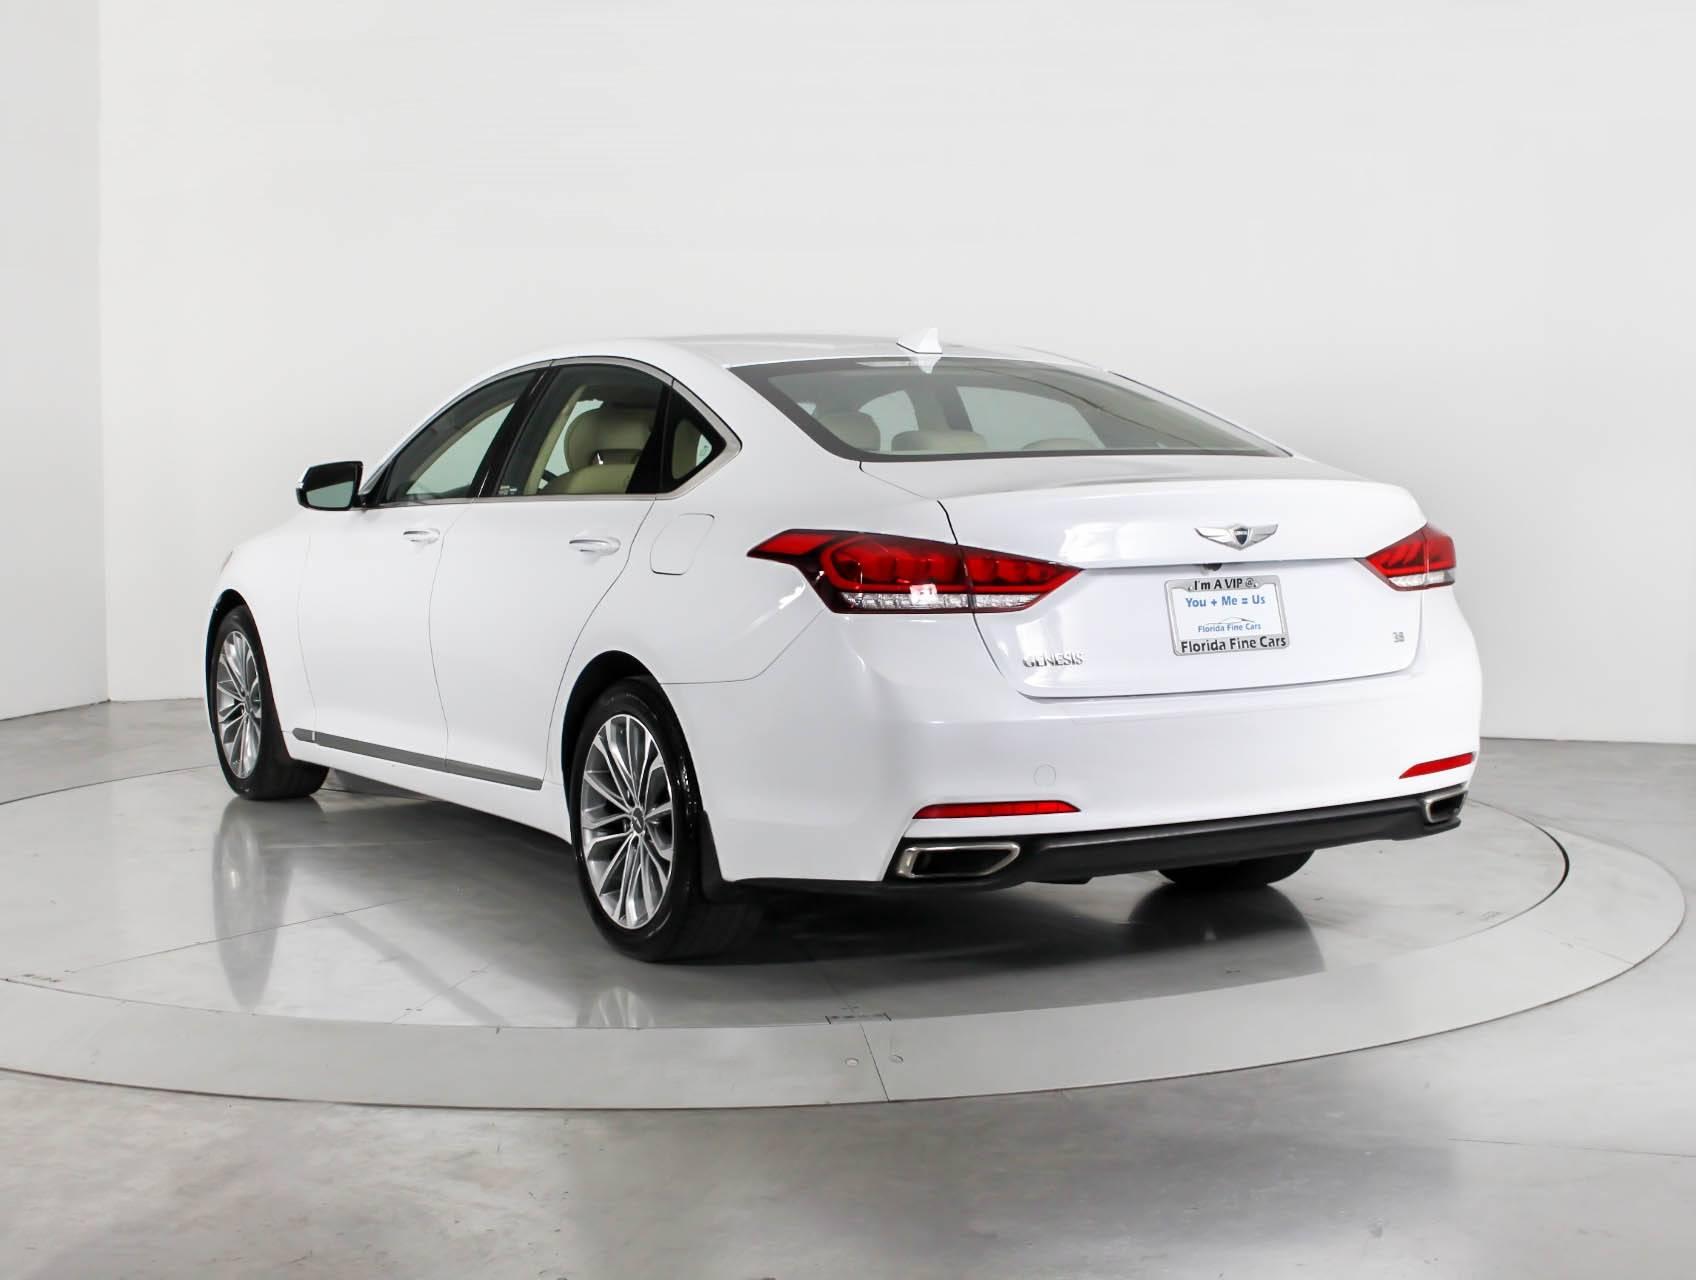 Used 2015 HYUNDAI GENESIS Sedan for sale in WEST PALM, FL | 92231 ...